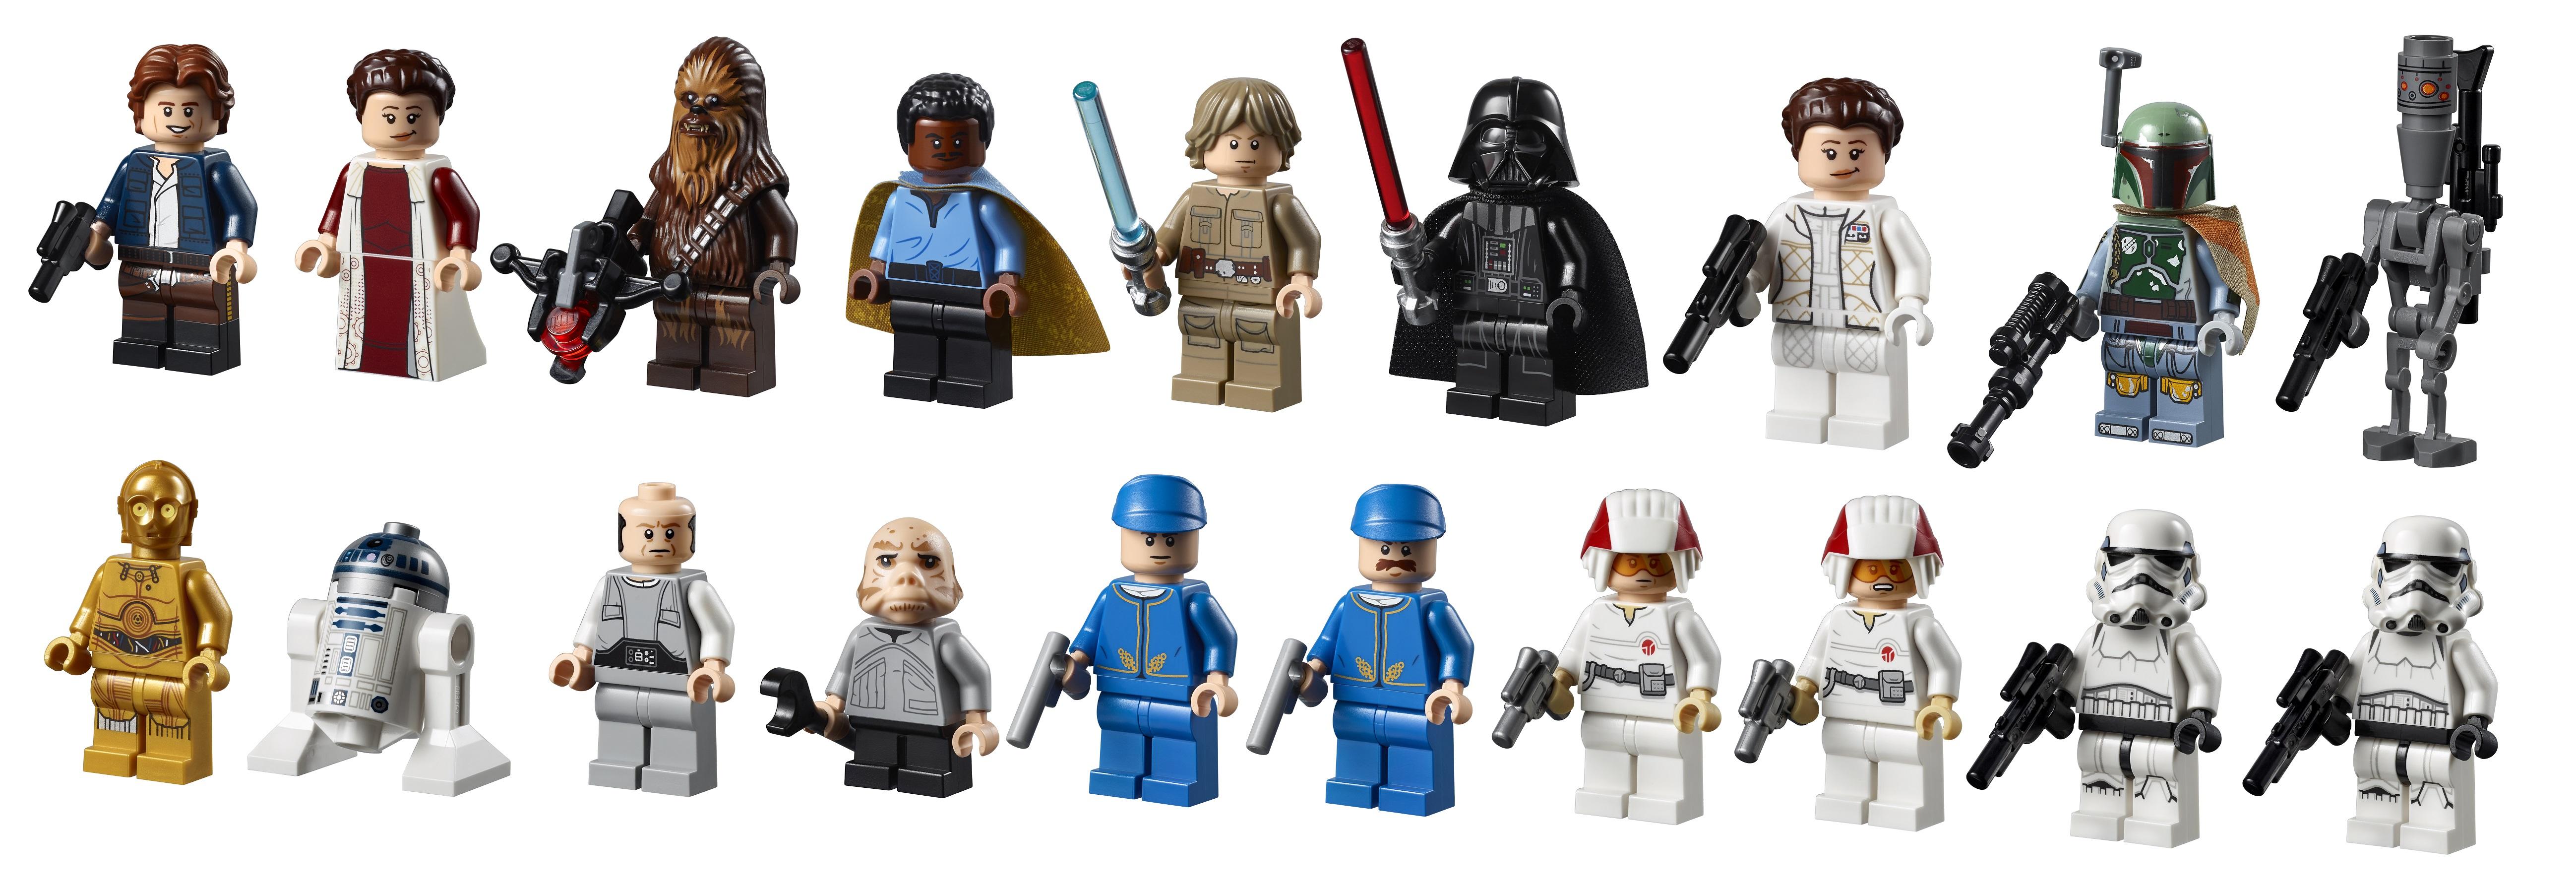 LEGO STAR WARS  PRINCESS LEIA MINIFIGURE 75222 CLOUD CITY NEW.